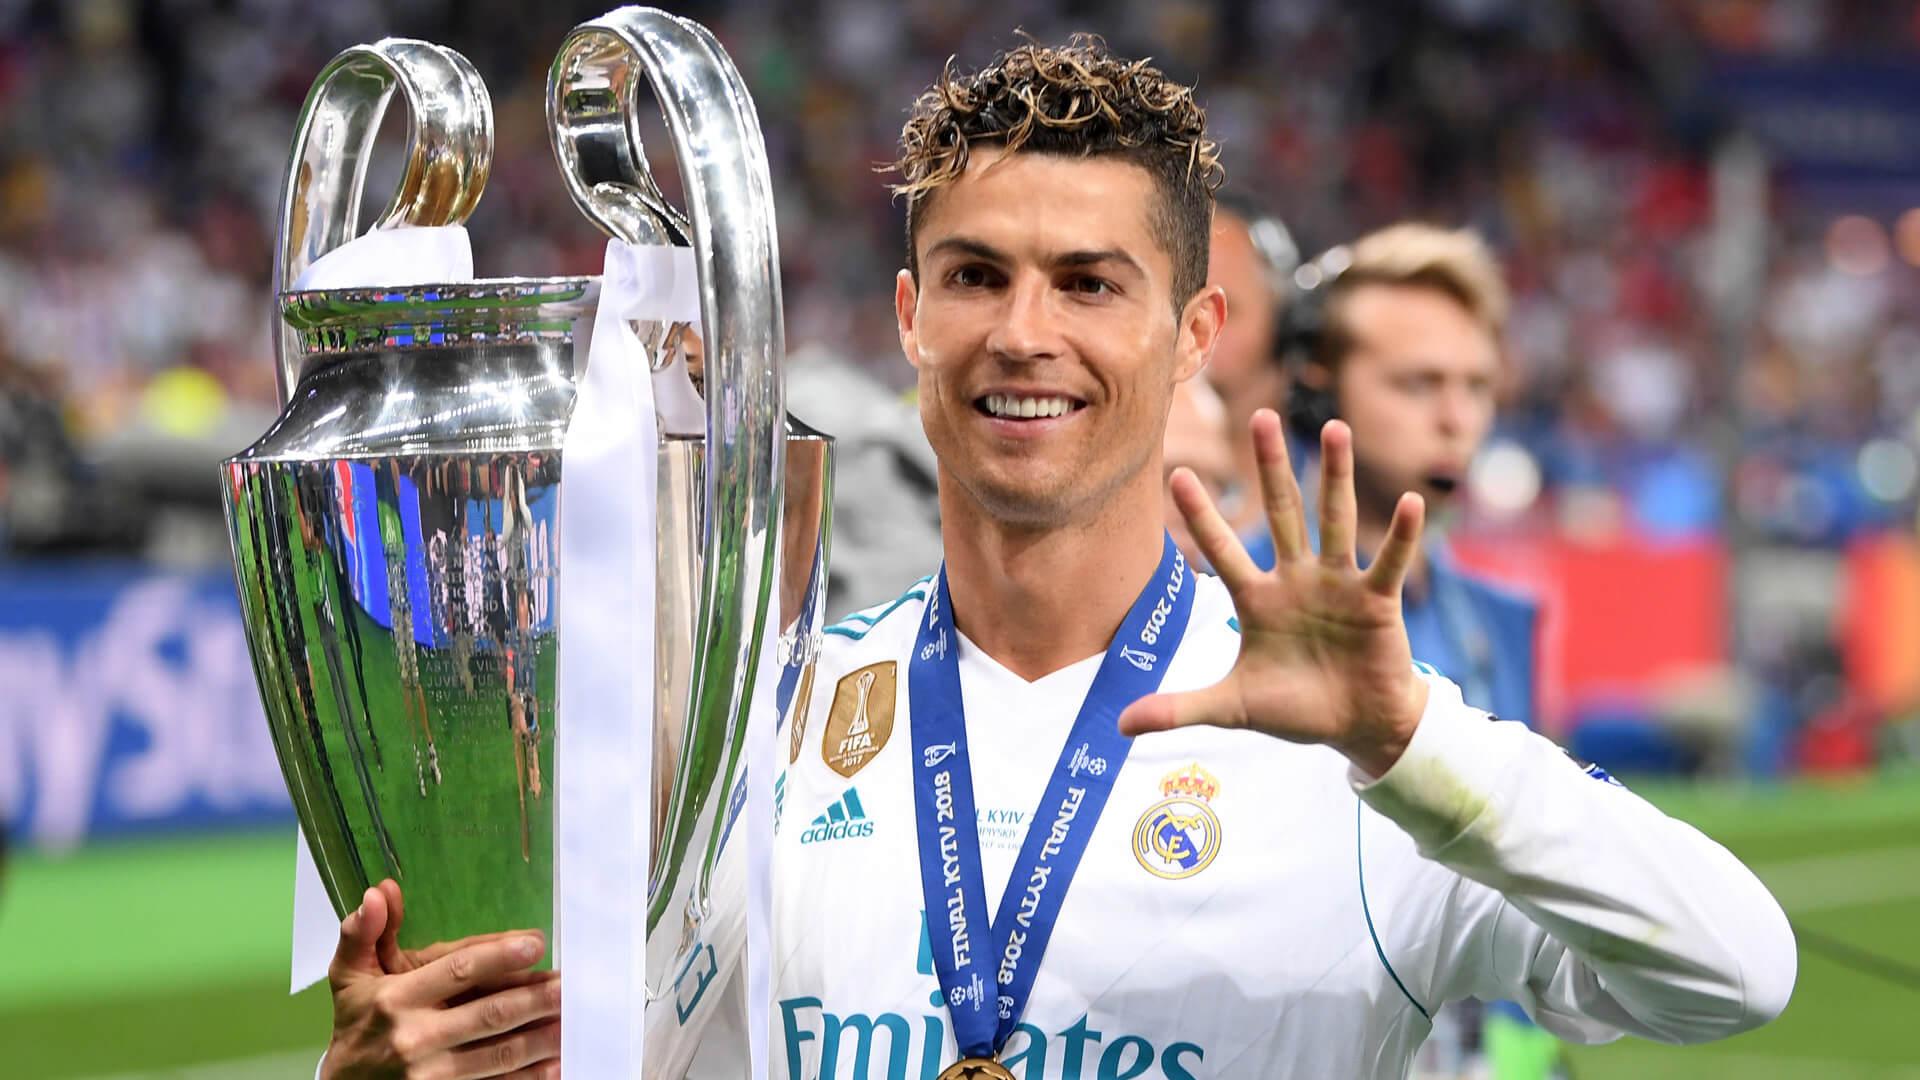 Cristiano Ronaldo Career Achievements